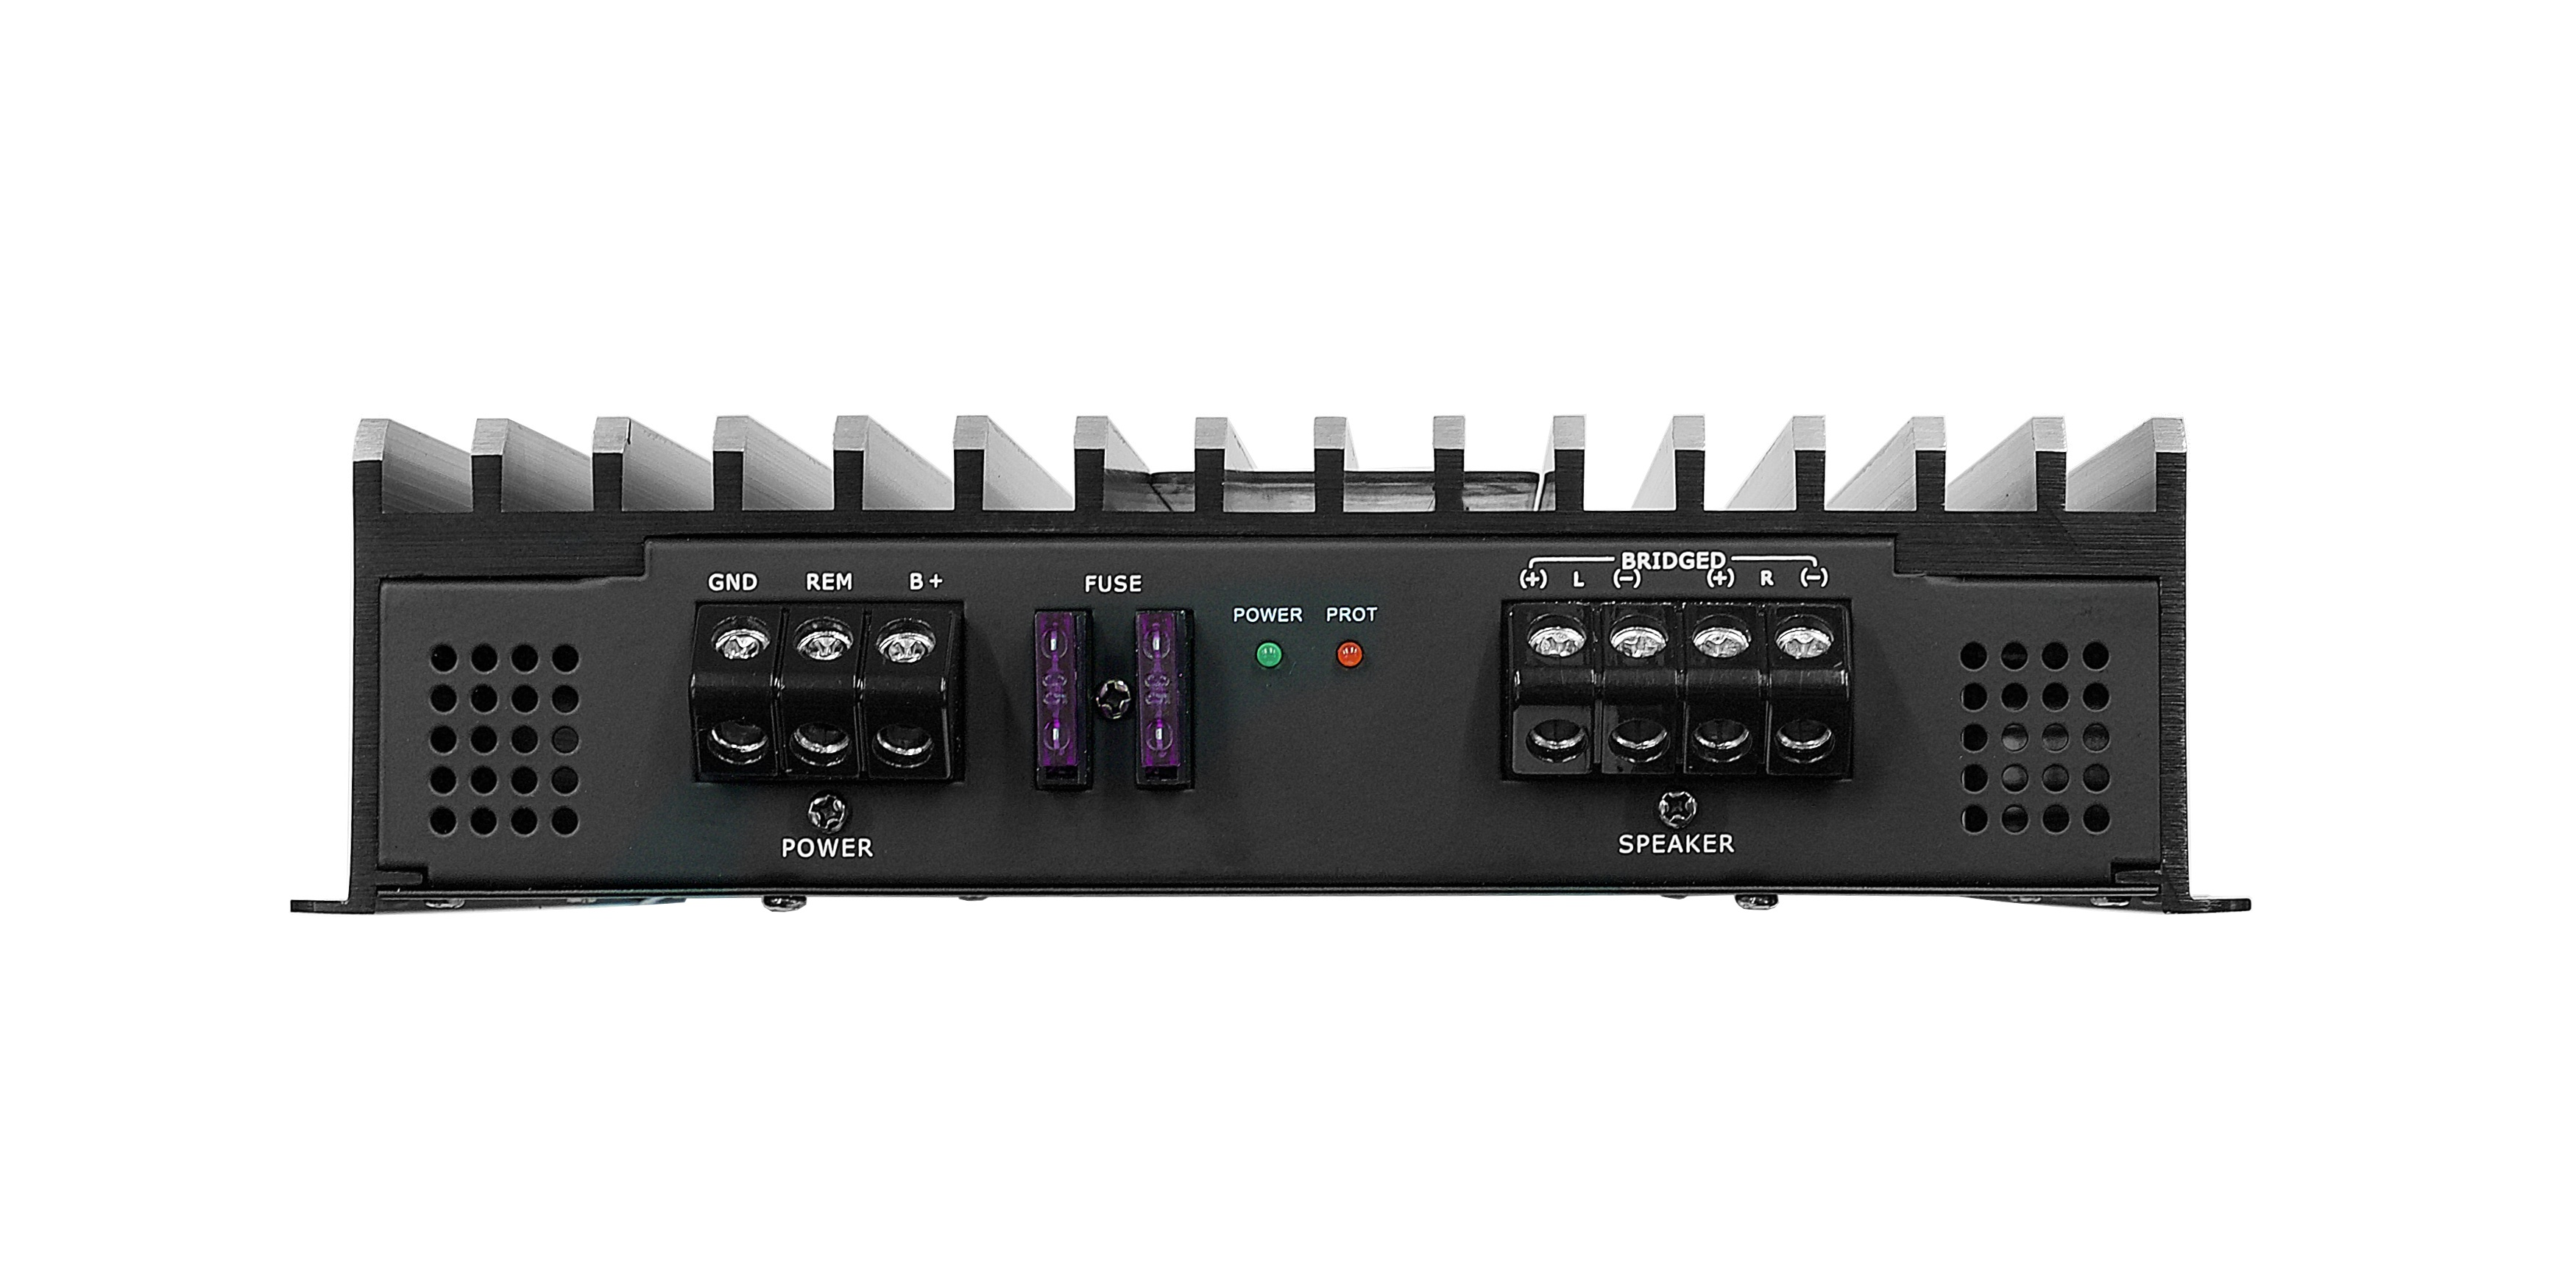 Db21s 2 1 Channel Bridgeable Stereo 12v Power Amplifier 540w 200 Watts Super Bridge Amplifiers Download Certification By Gordon Taylor V1